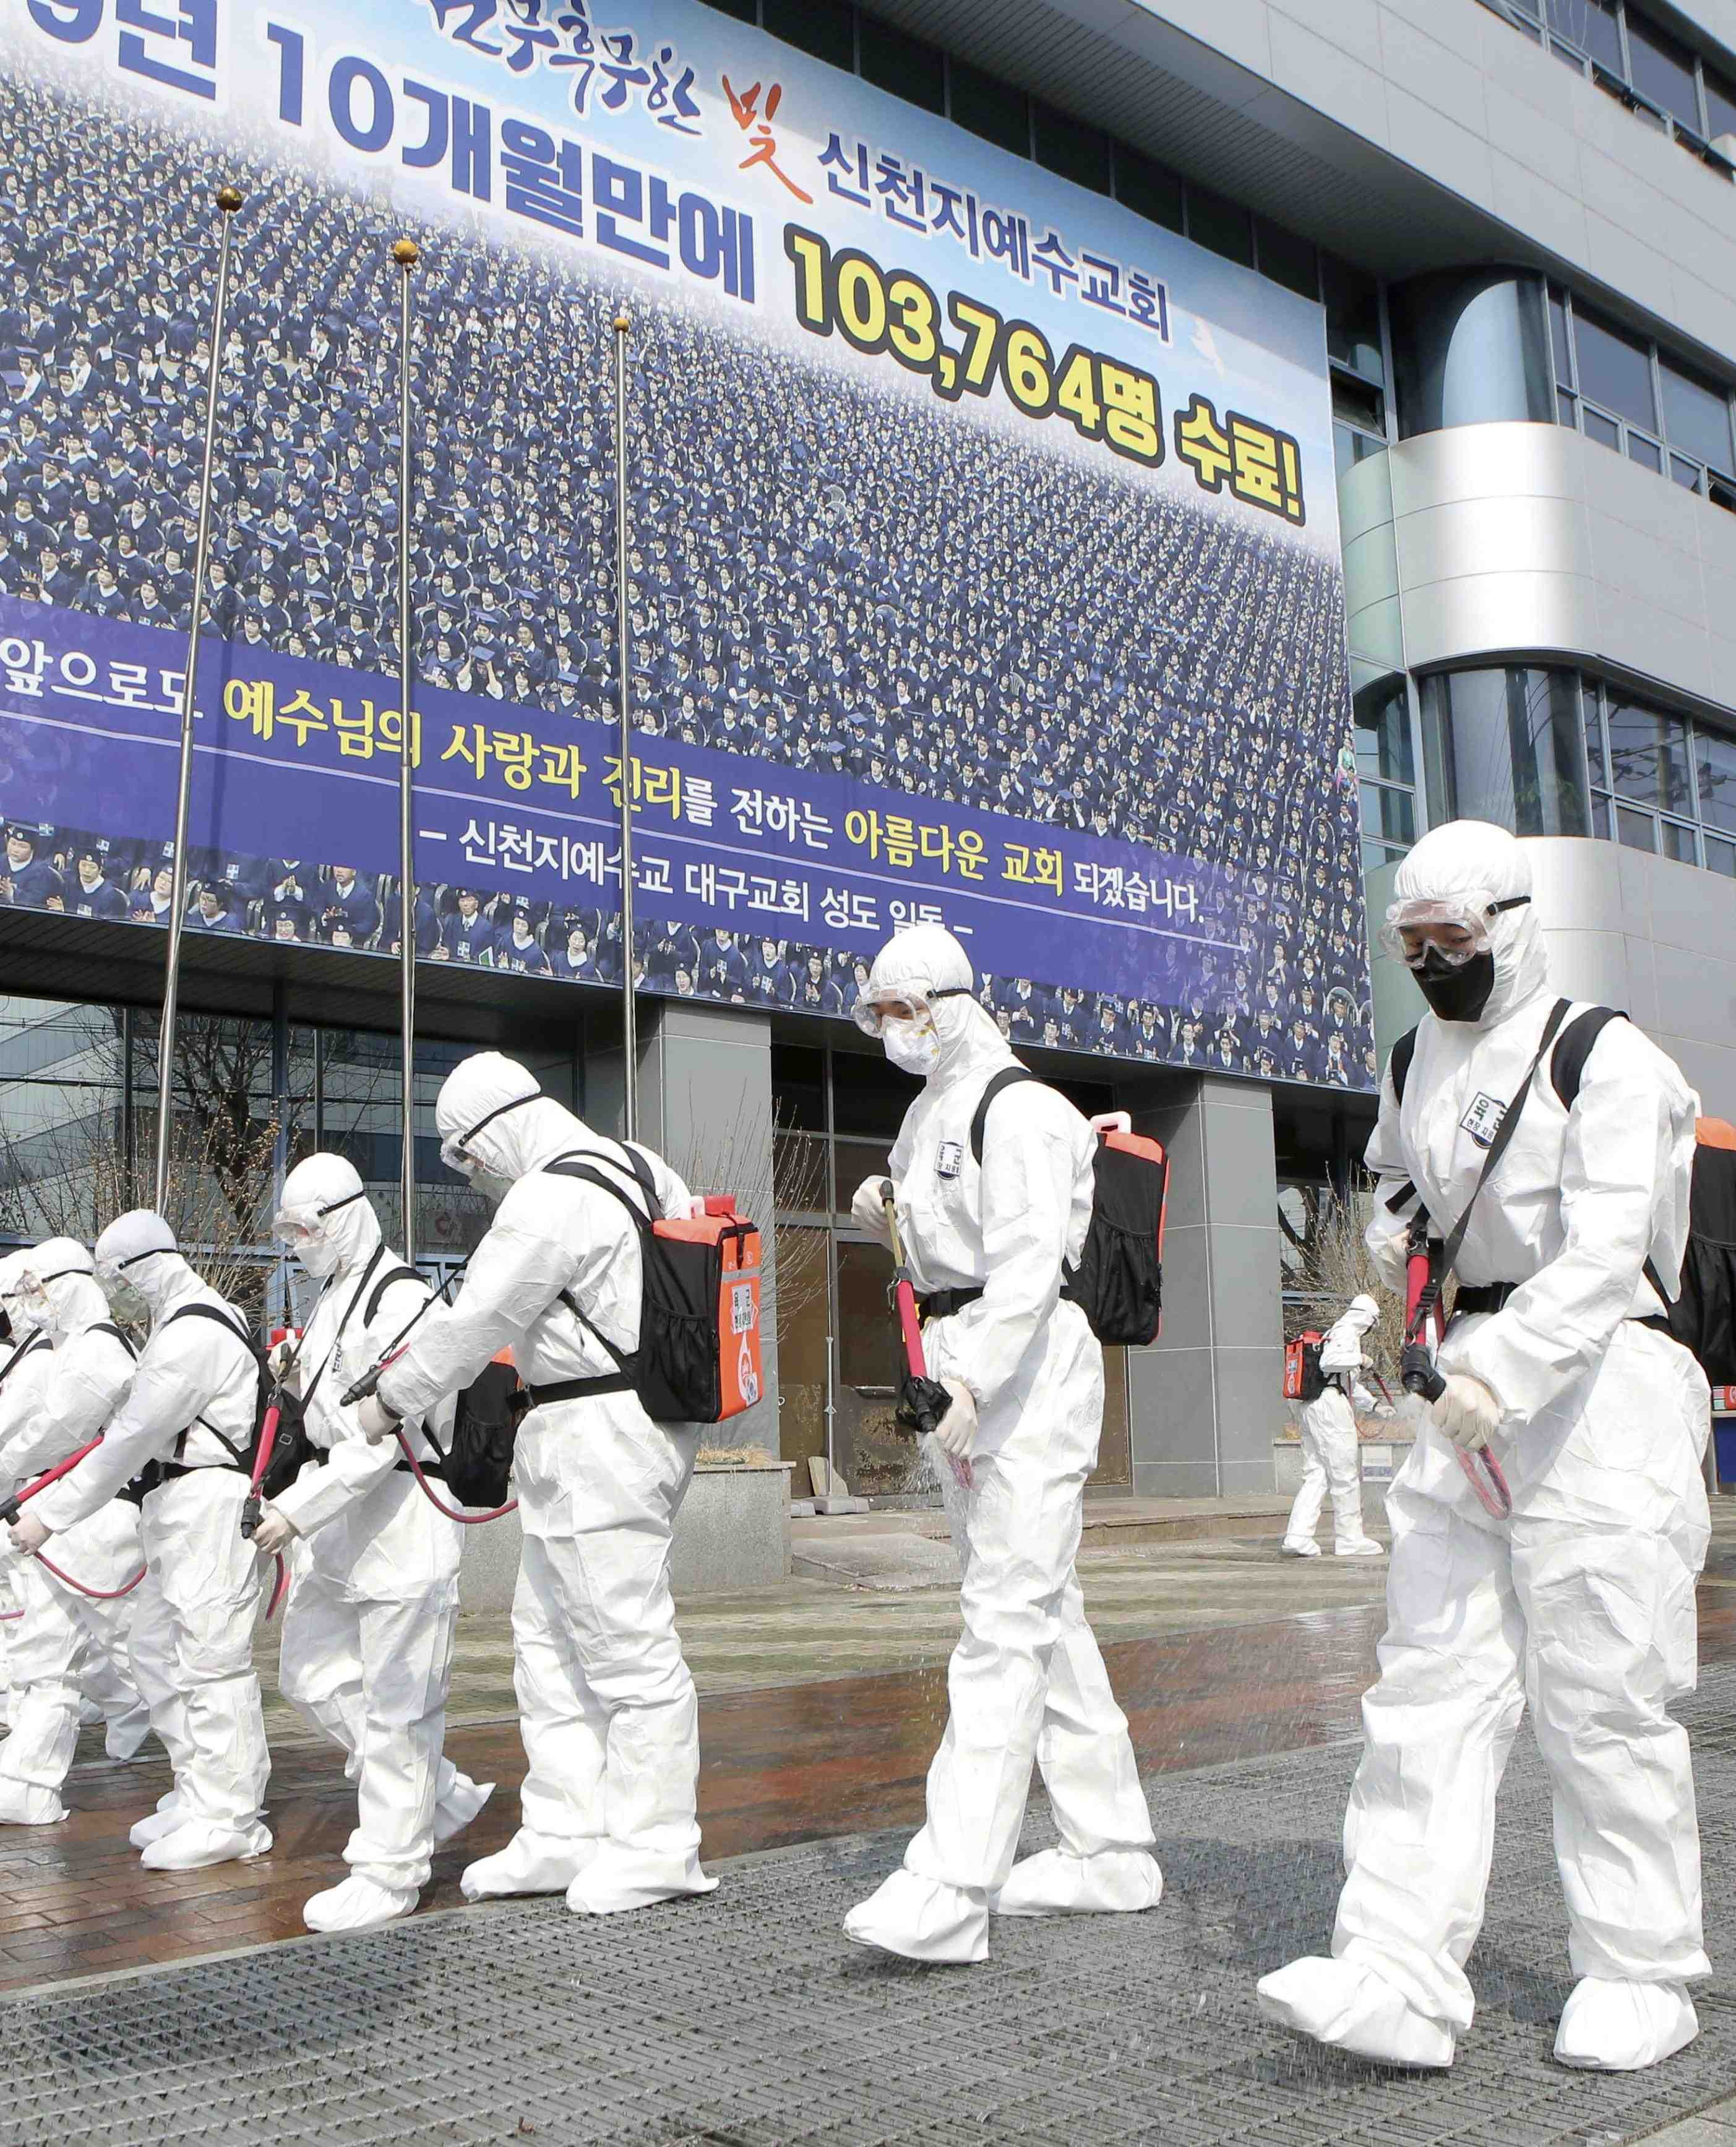 South Korea Election and Coronavirus 003